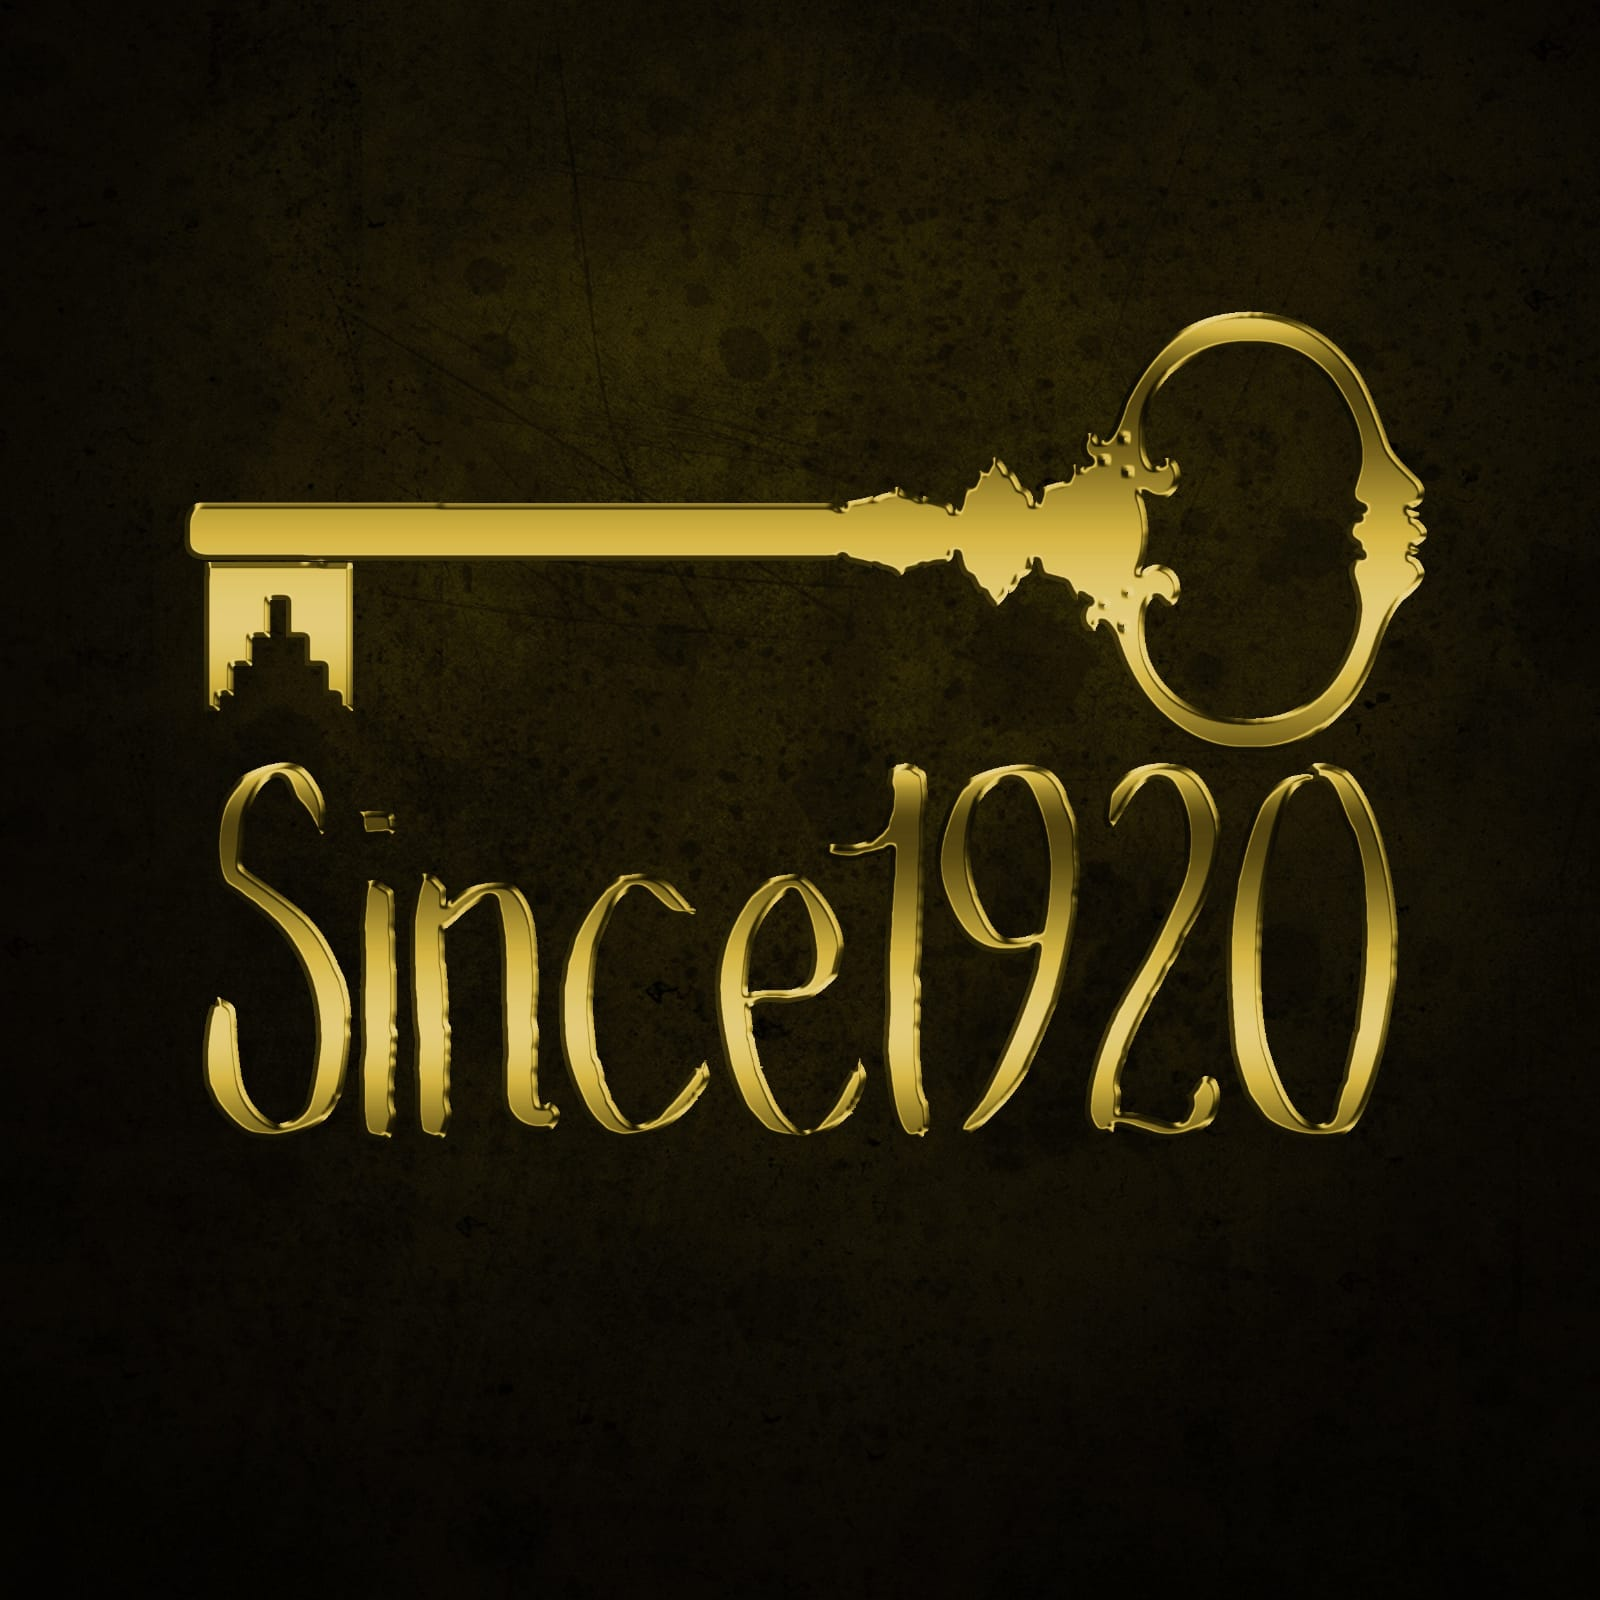 Since 1920